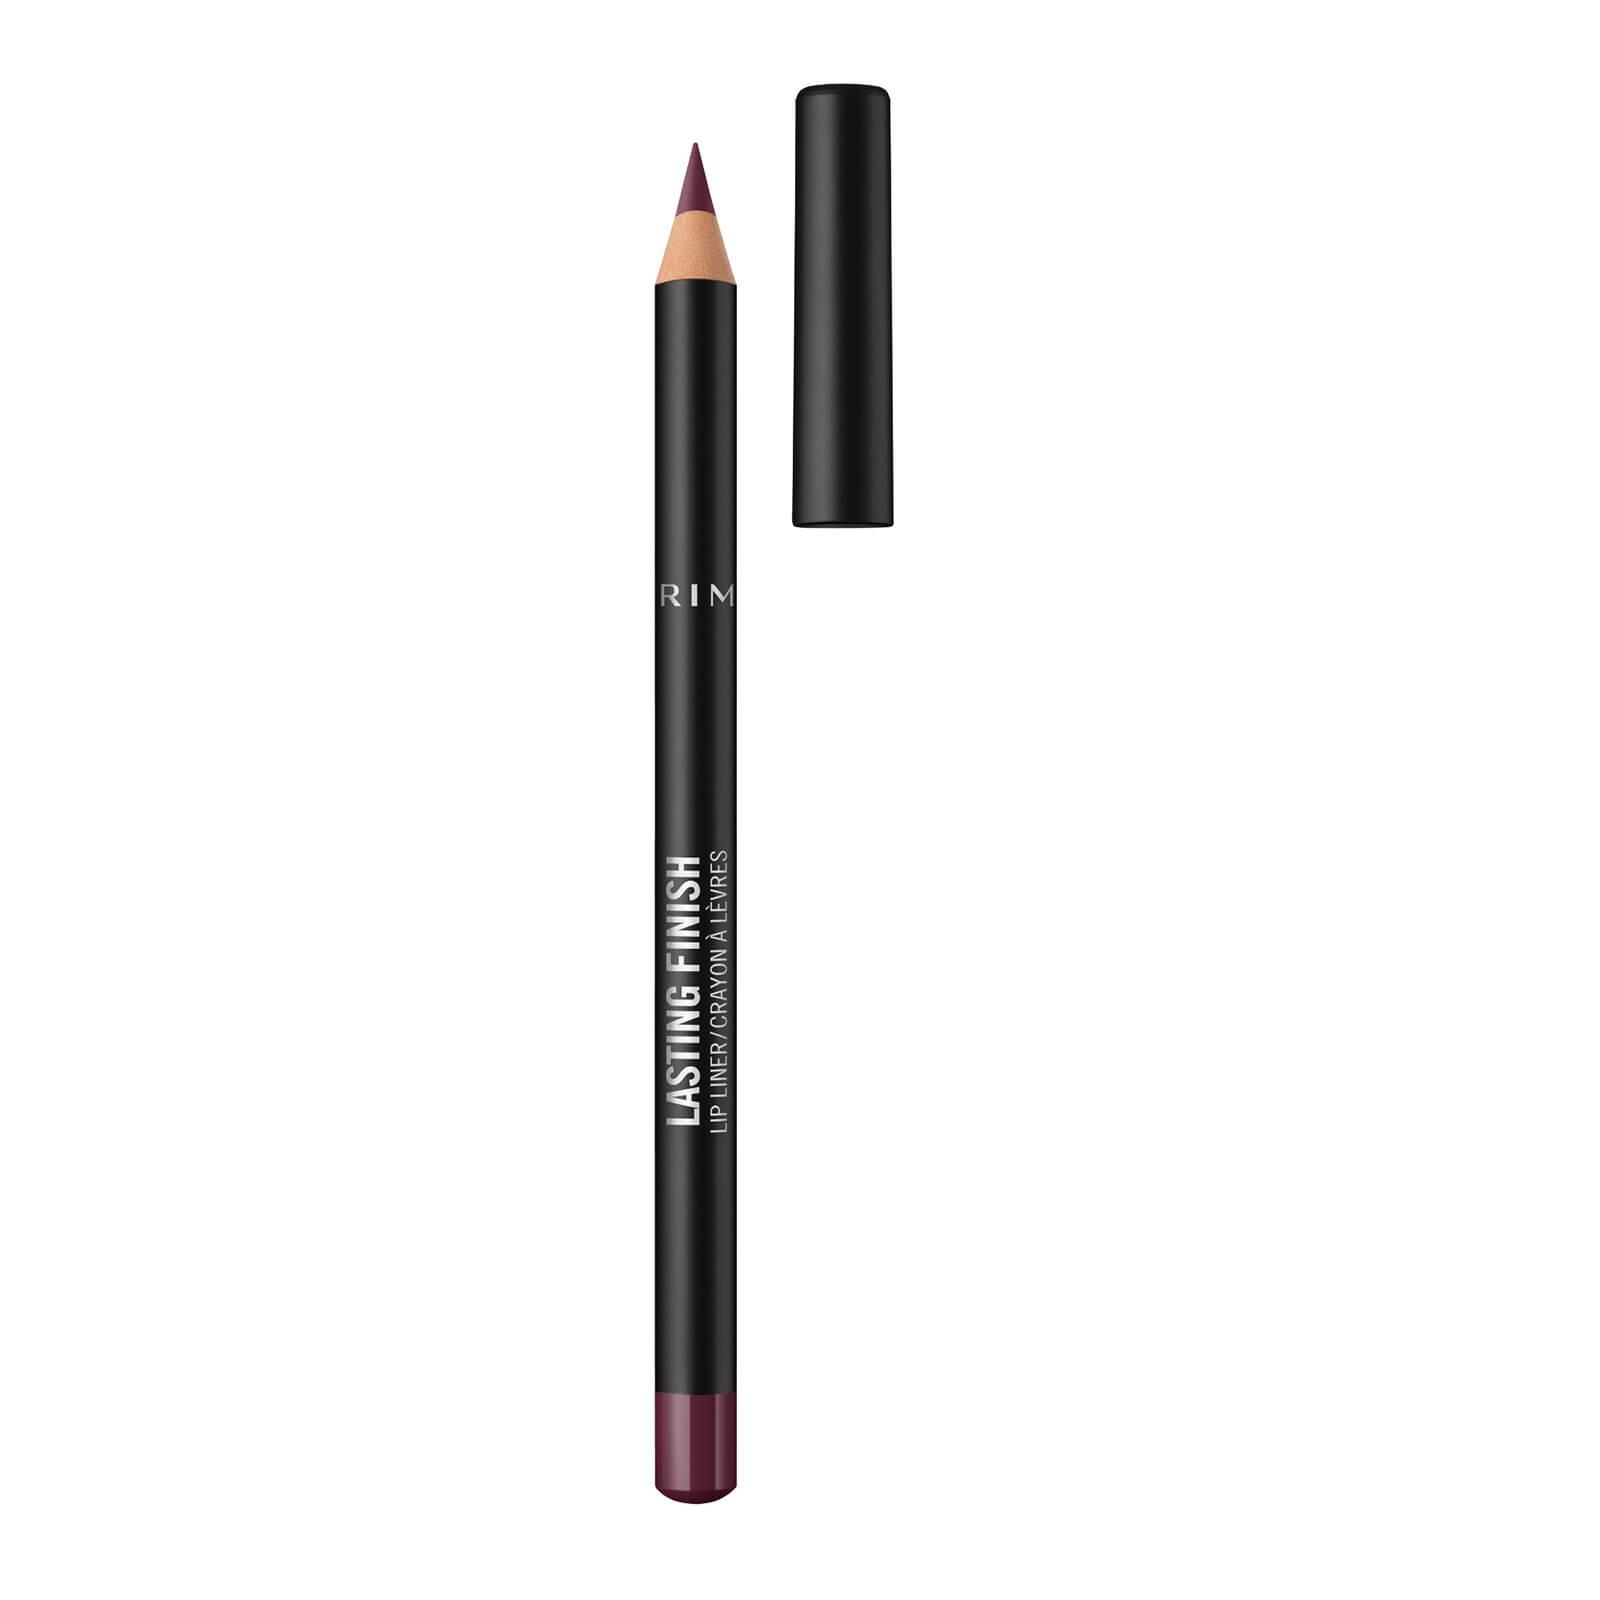 Купить Rimmel Lasting Finish 8HR Lip Liner (Various Shades) - Underground 850